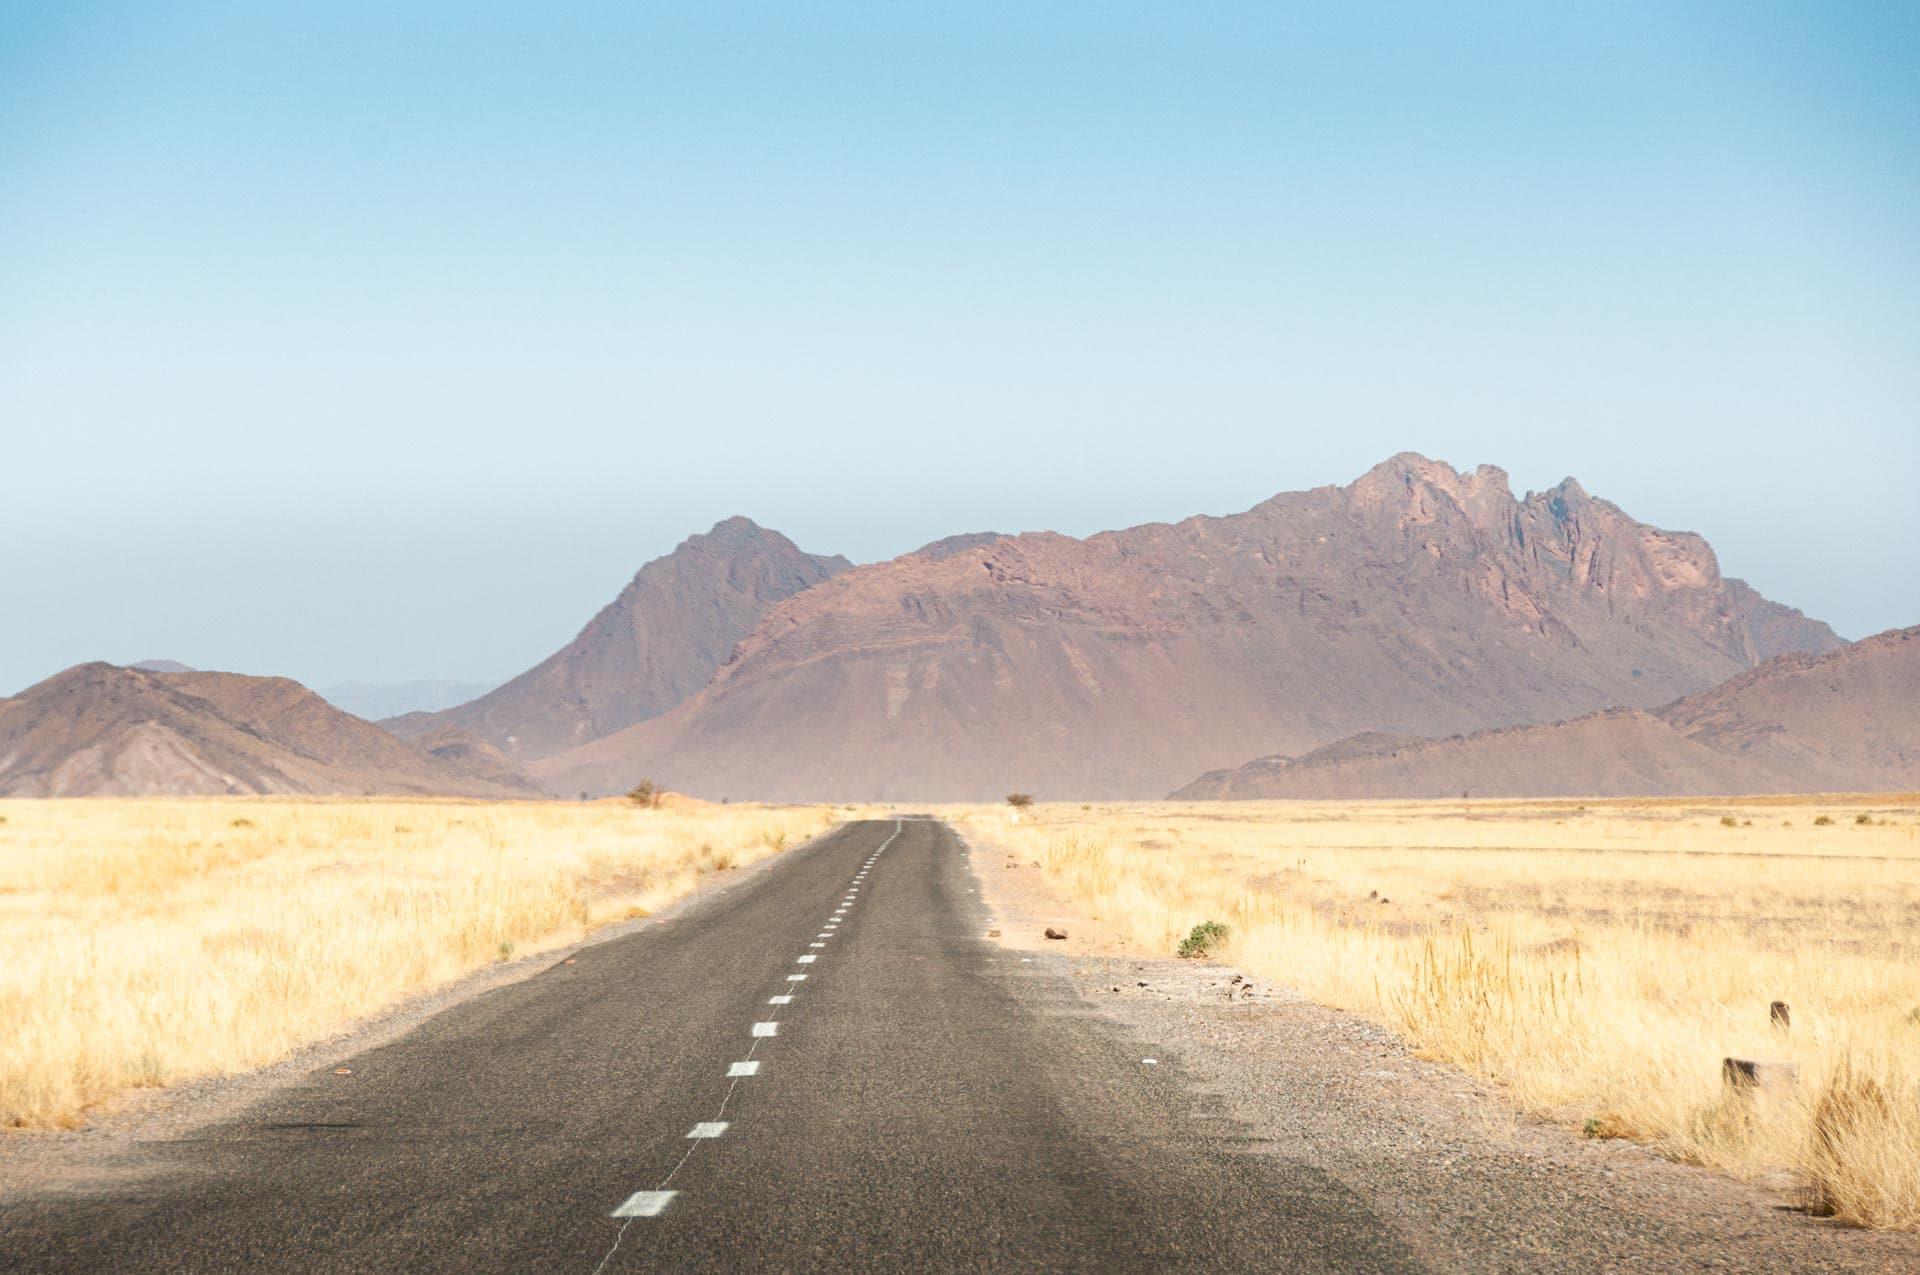 Hoher Atlas Gebirge in Marokko